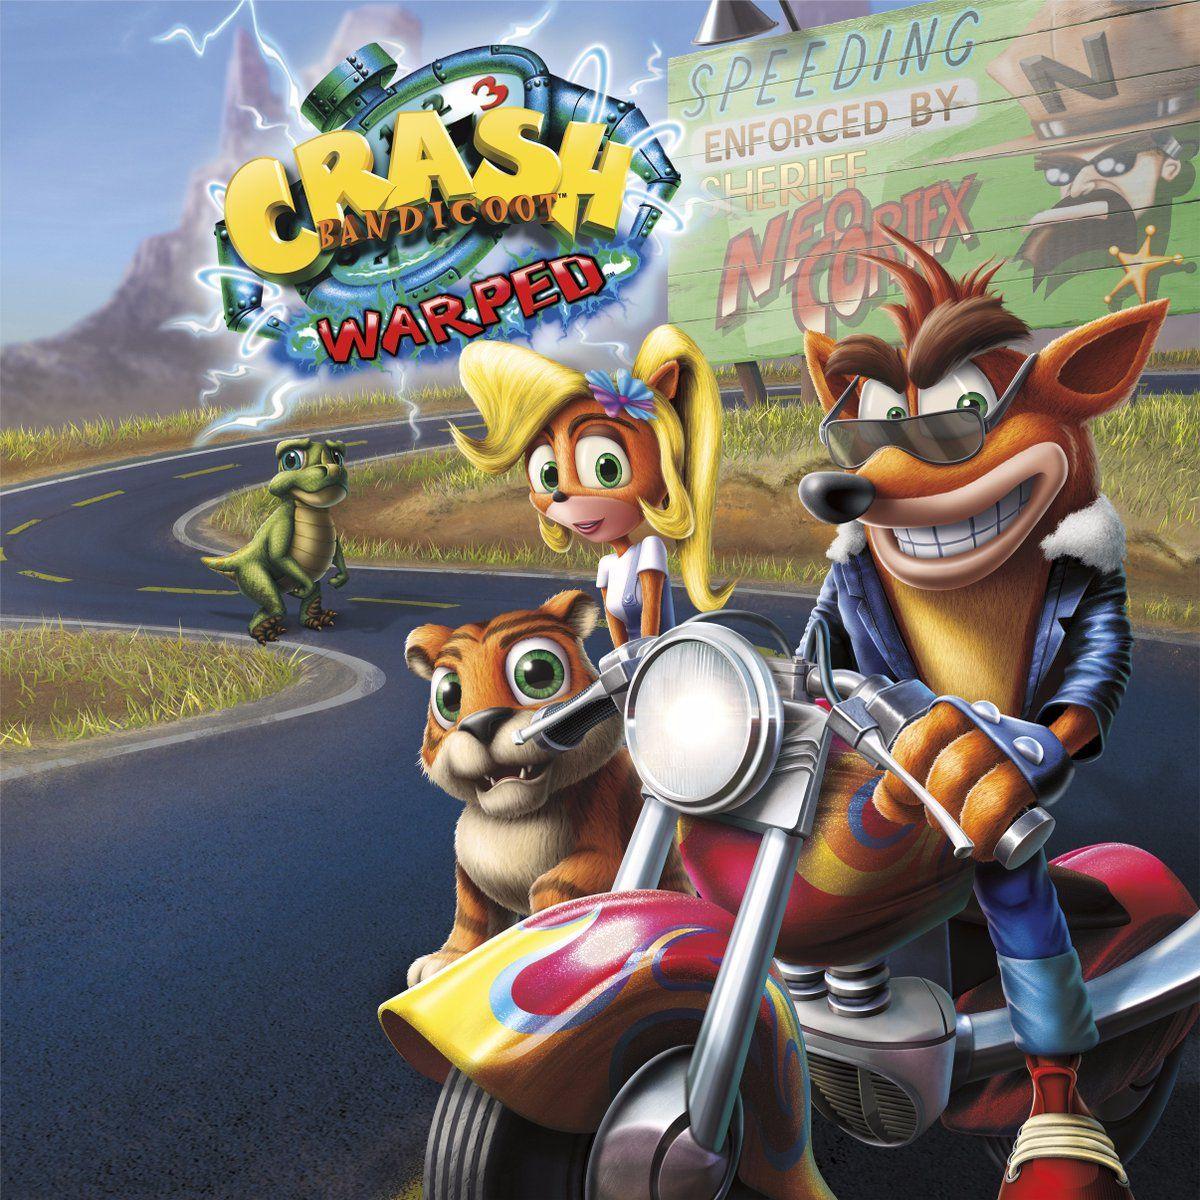 Crash Bandicoot N Sane Trilogy Crash Bandicoot Bandicoot Crash Bandicoot 3 Warped